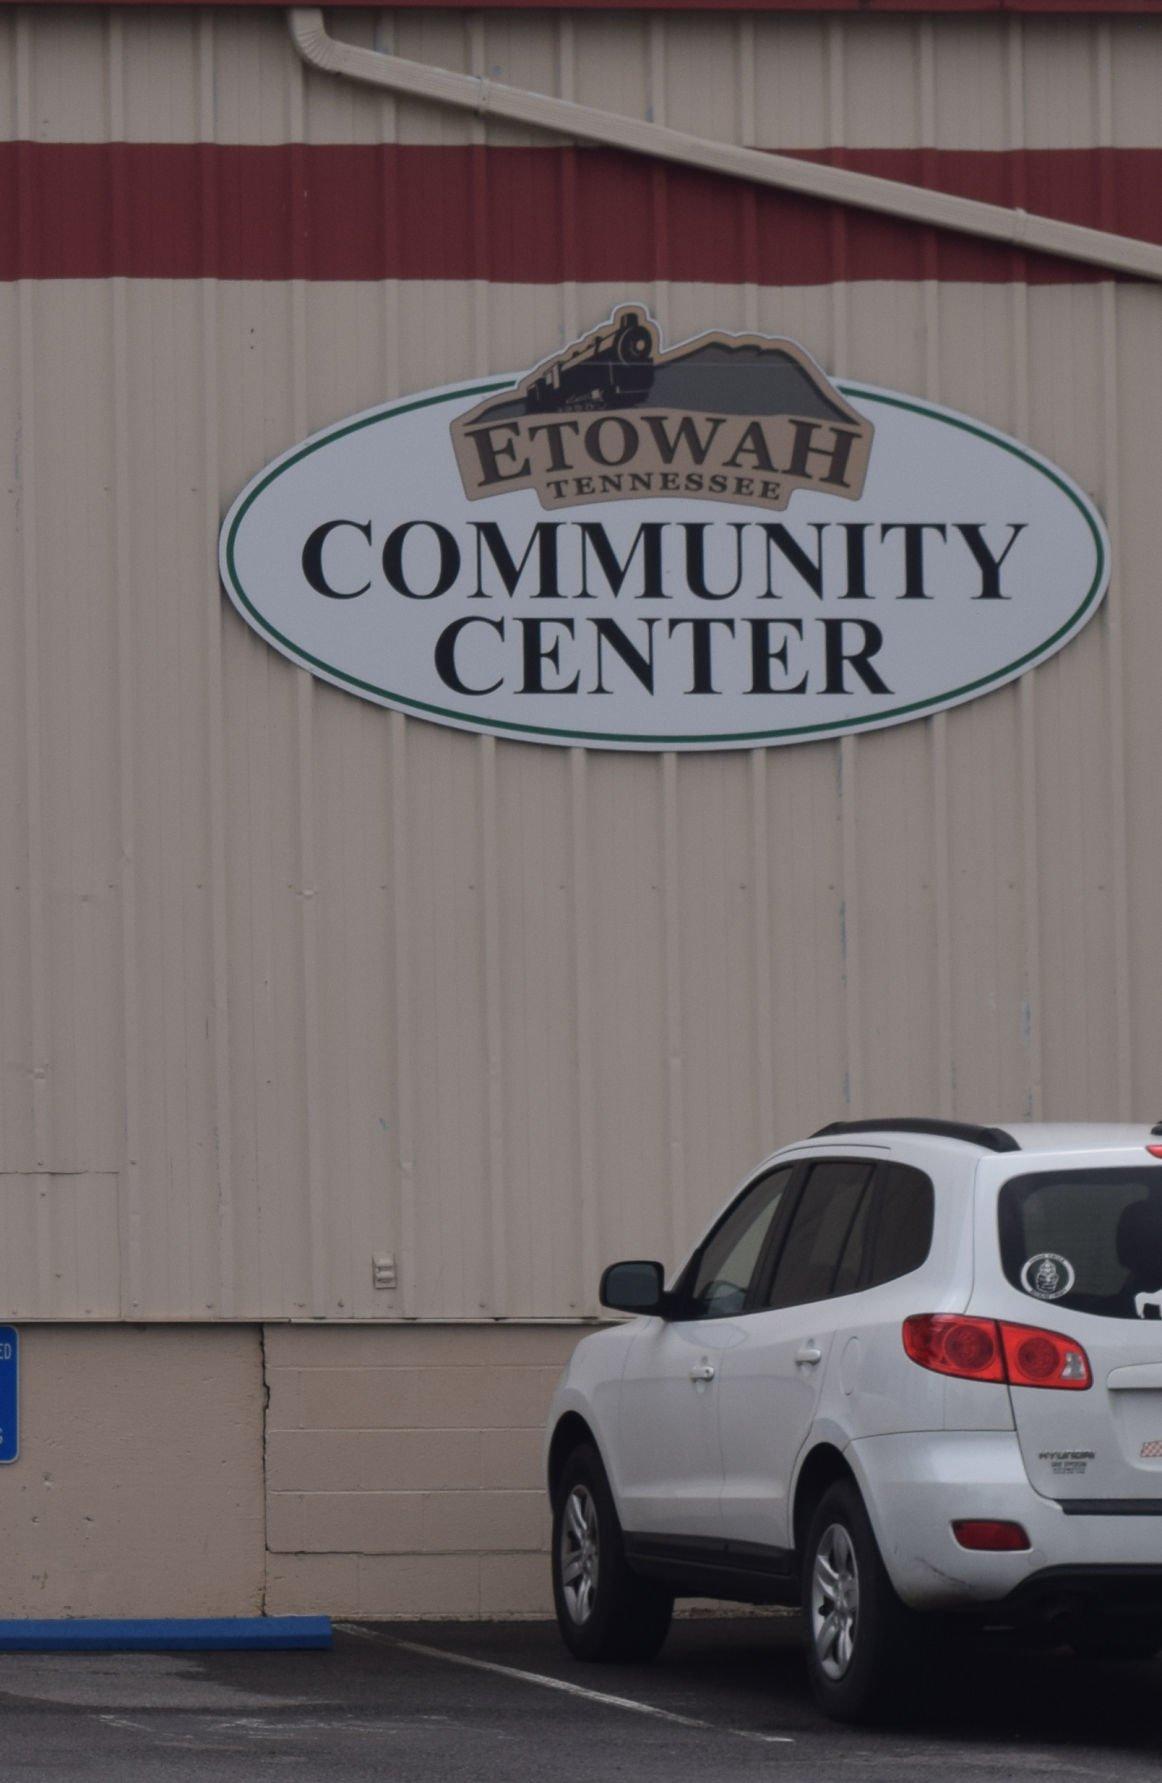 Community center temporarily closed